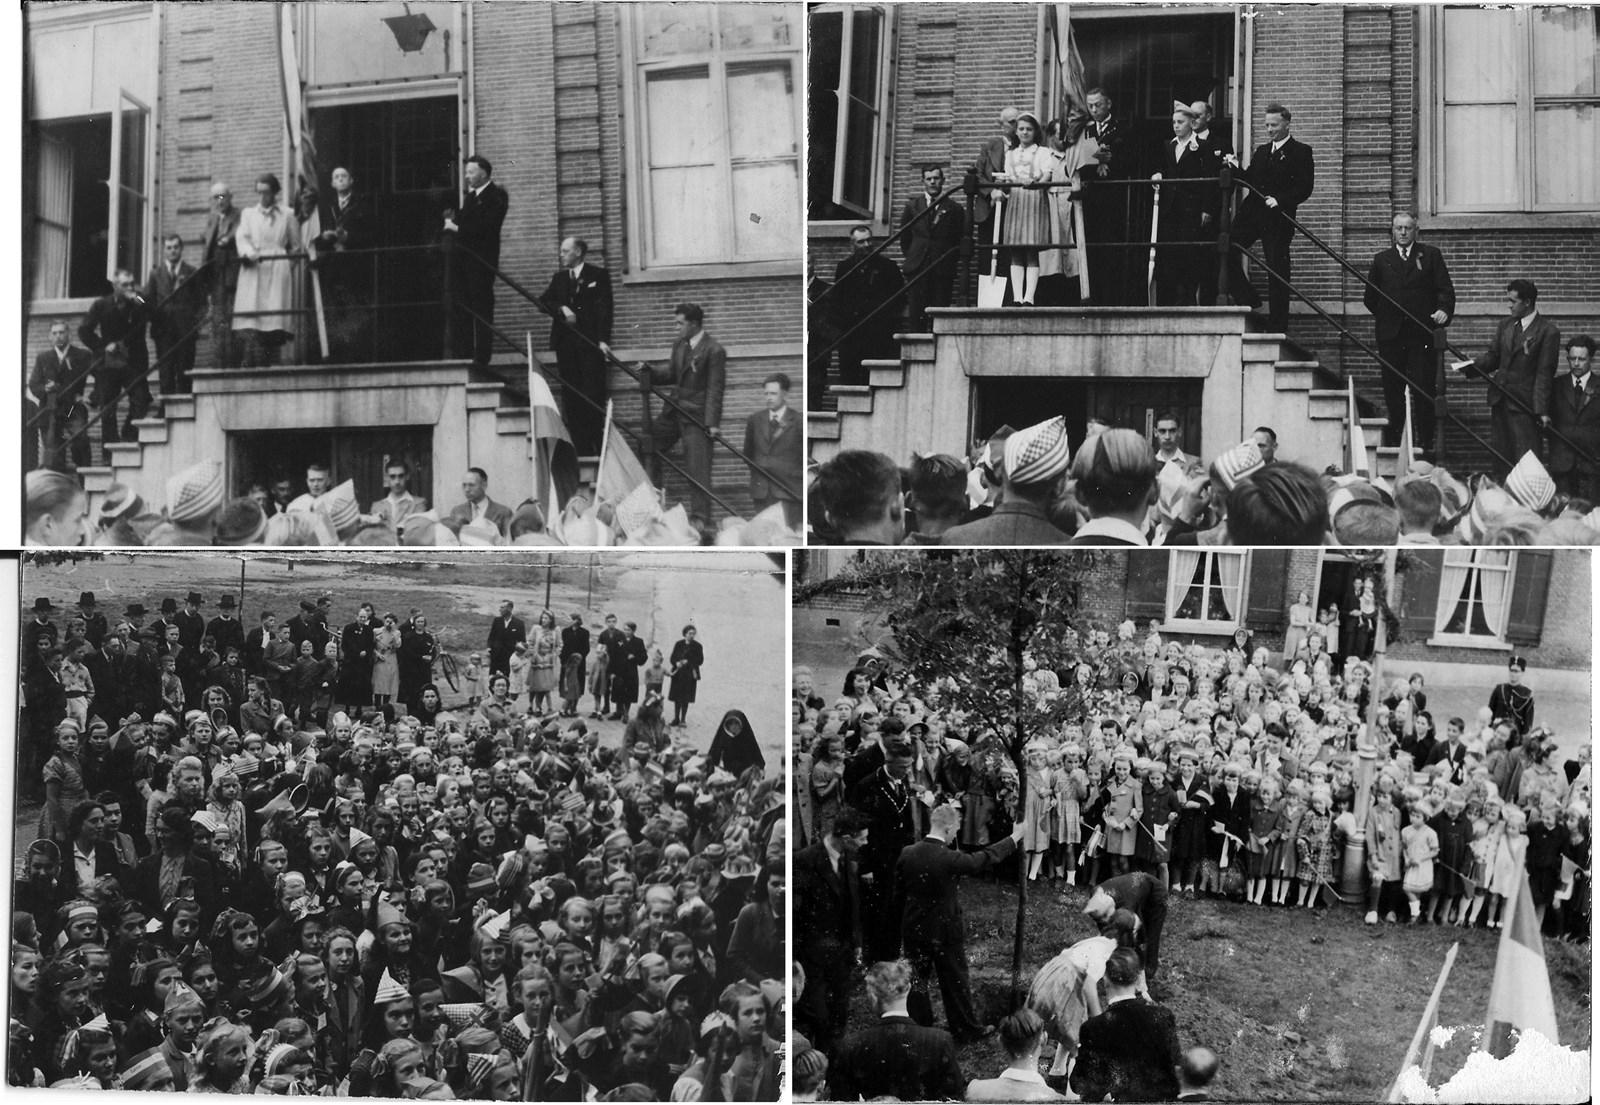 1945, 31 augustus, Koninginnedag, planten Bevrijdingsboom